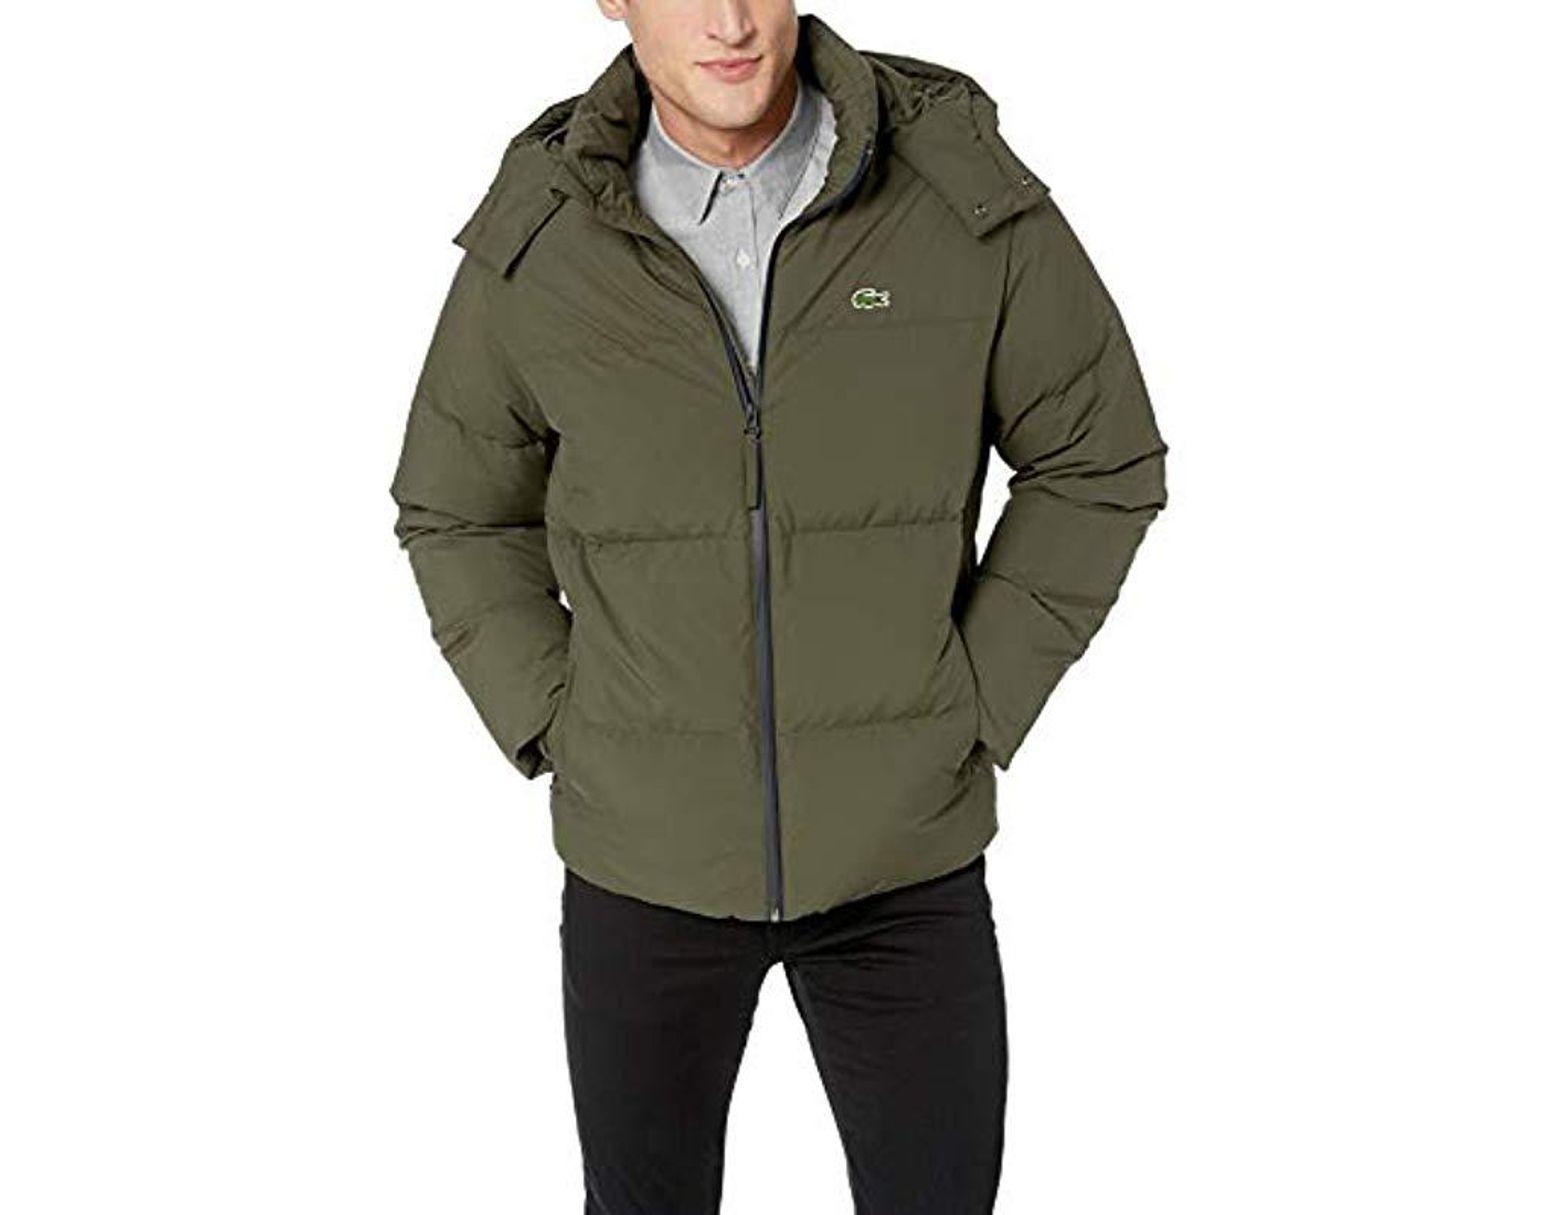 8431d733c74 Men's Green Water-resistant Taffeta Jackets With Detachable Hood